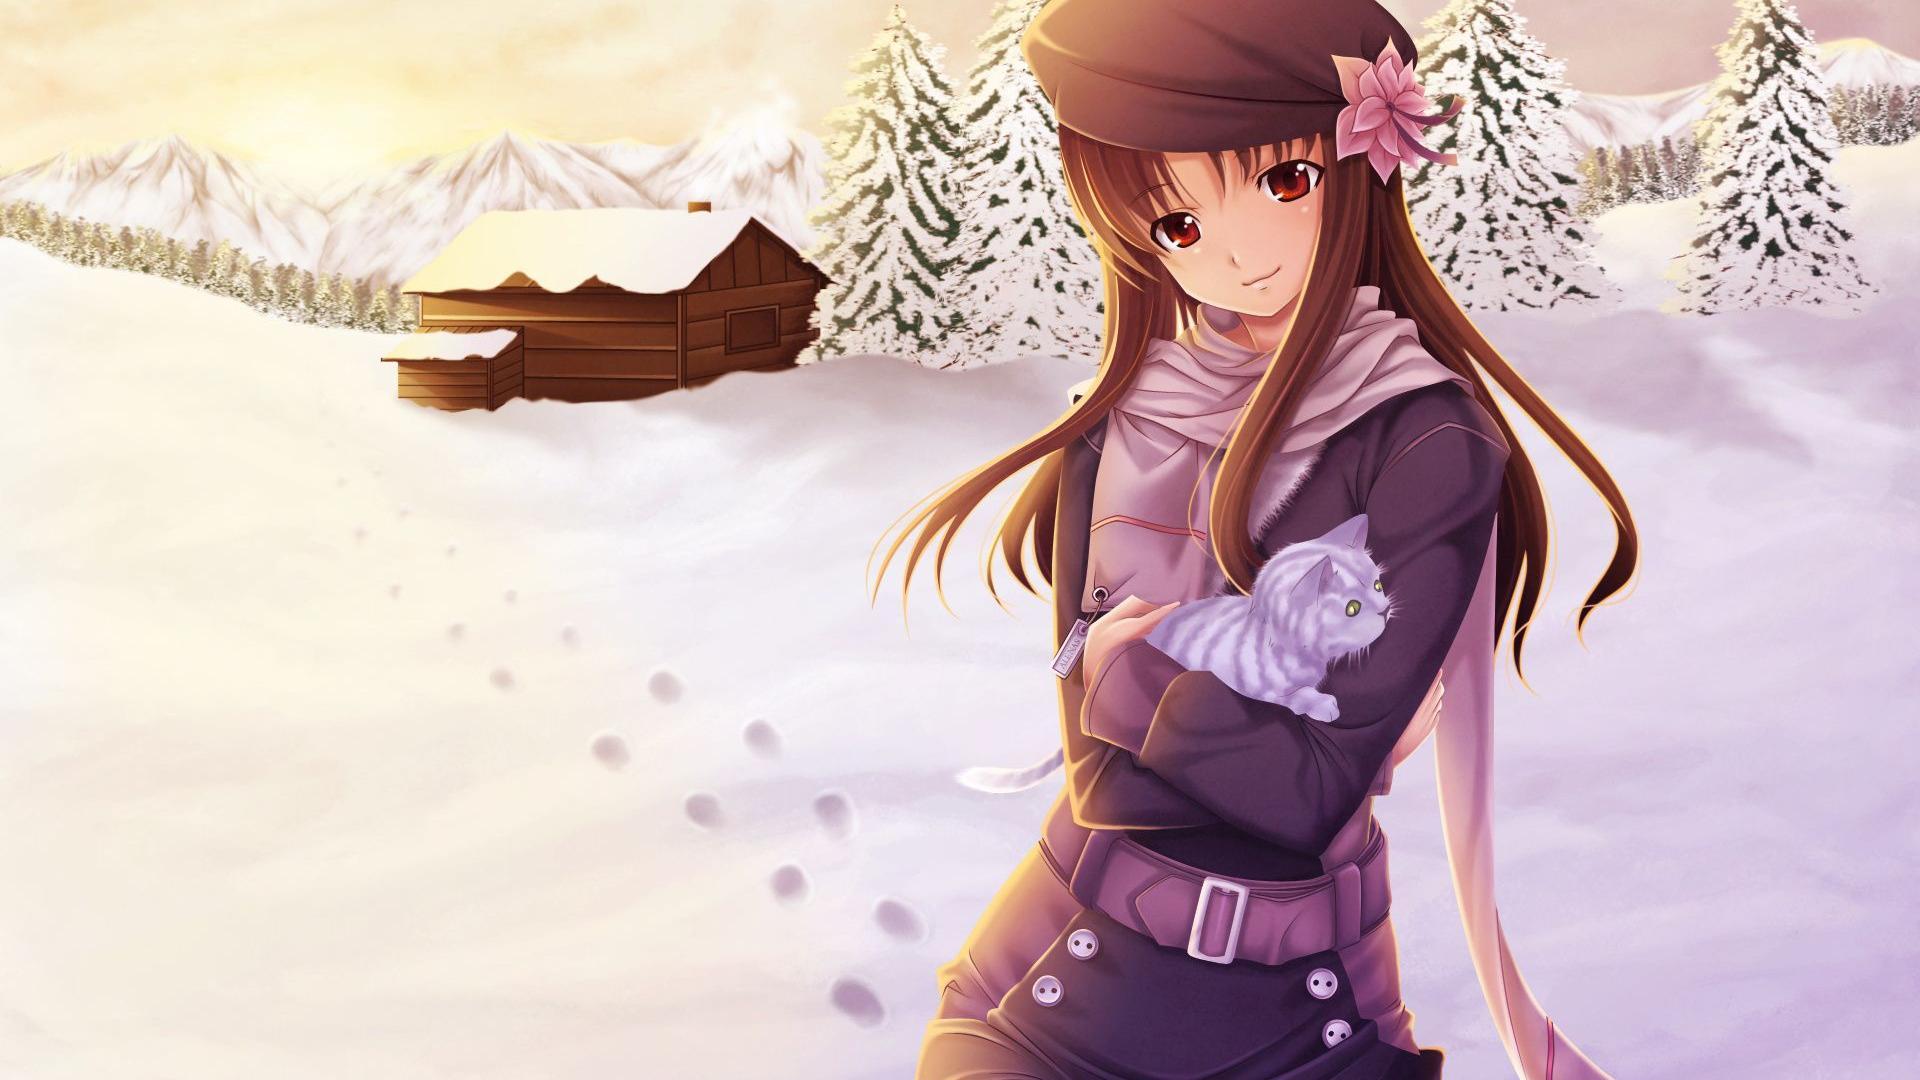 Anime Girl Winter Snow HD Wallpaper of Anime   hdwallpaper2013com 1920x1080